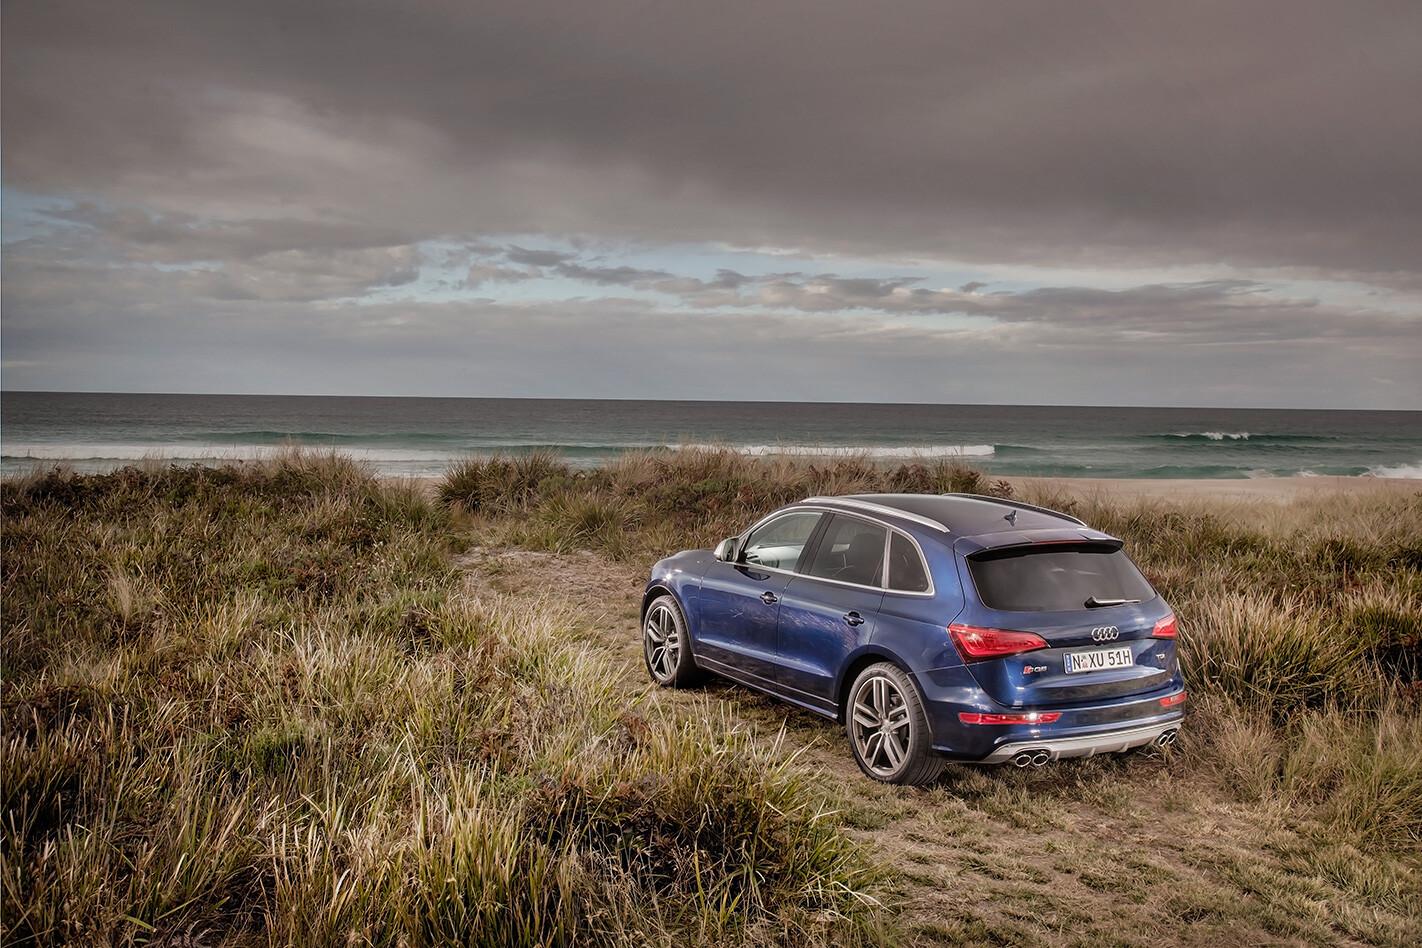 Audi SQ5 rear.jpg